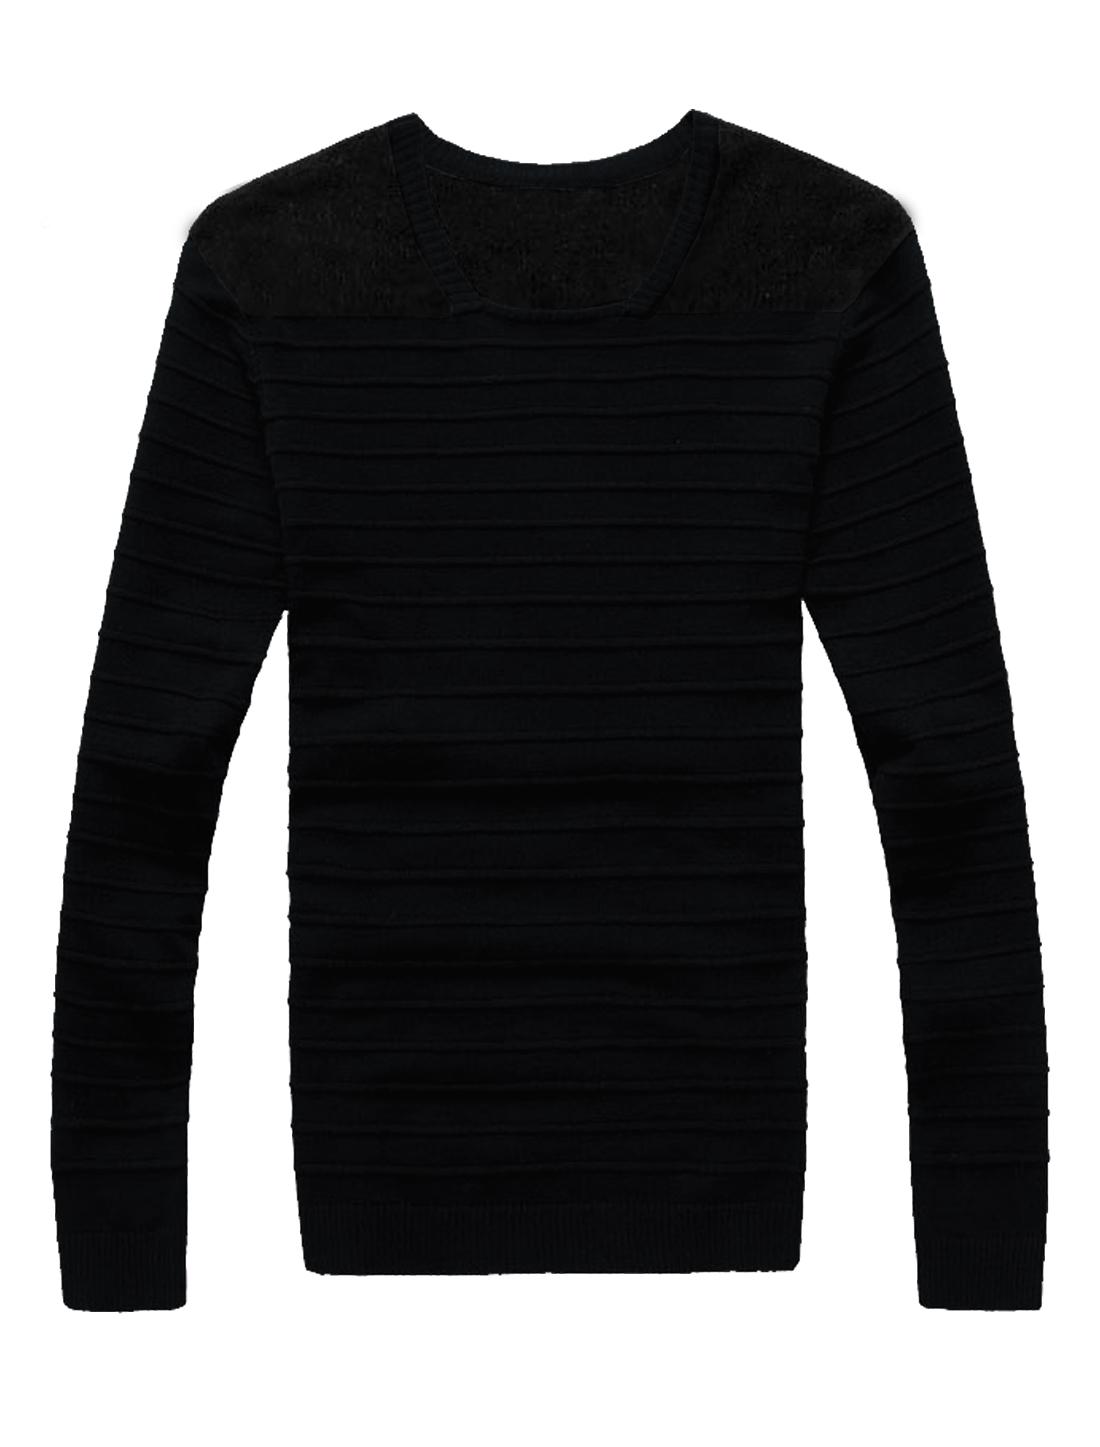 Men Plush Panel Stripes Design Square Neck Long Sleeves Jumper Black M